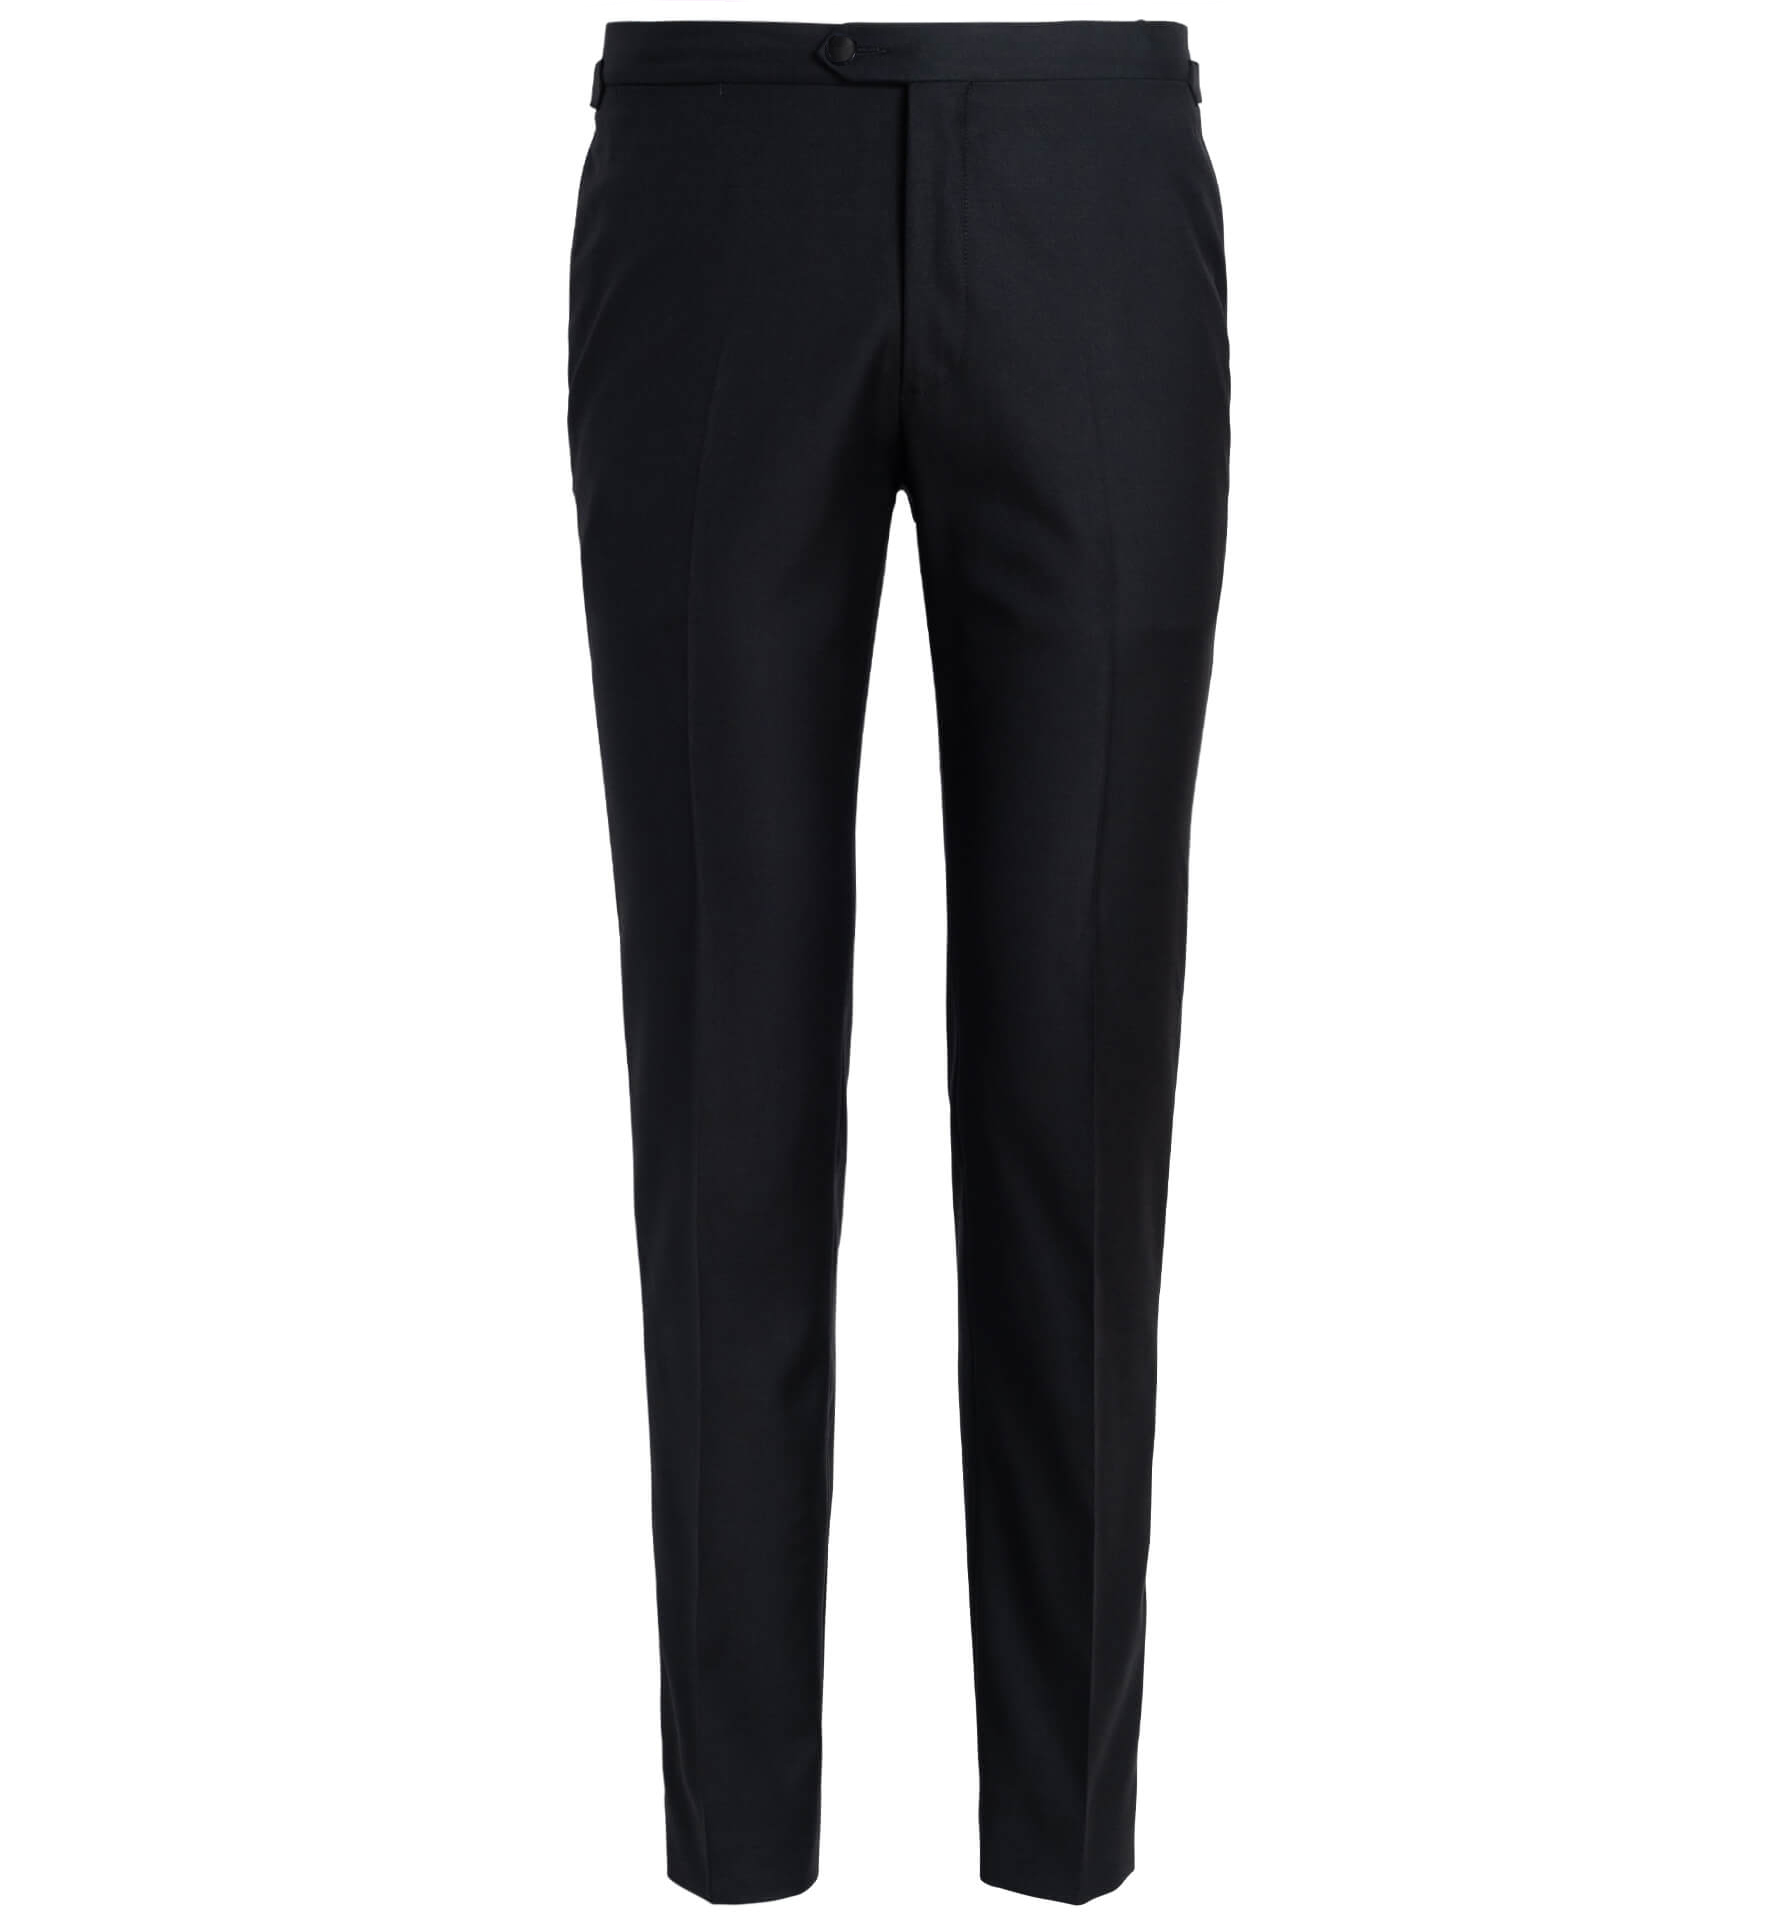 Zoom Image of Mayfair Black Wool Tuxedo Pant